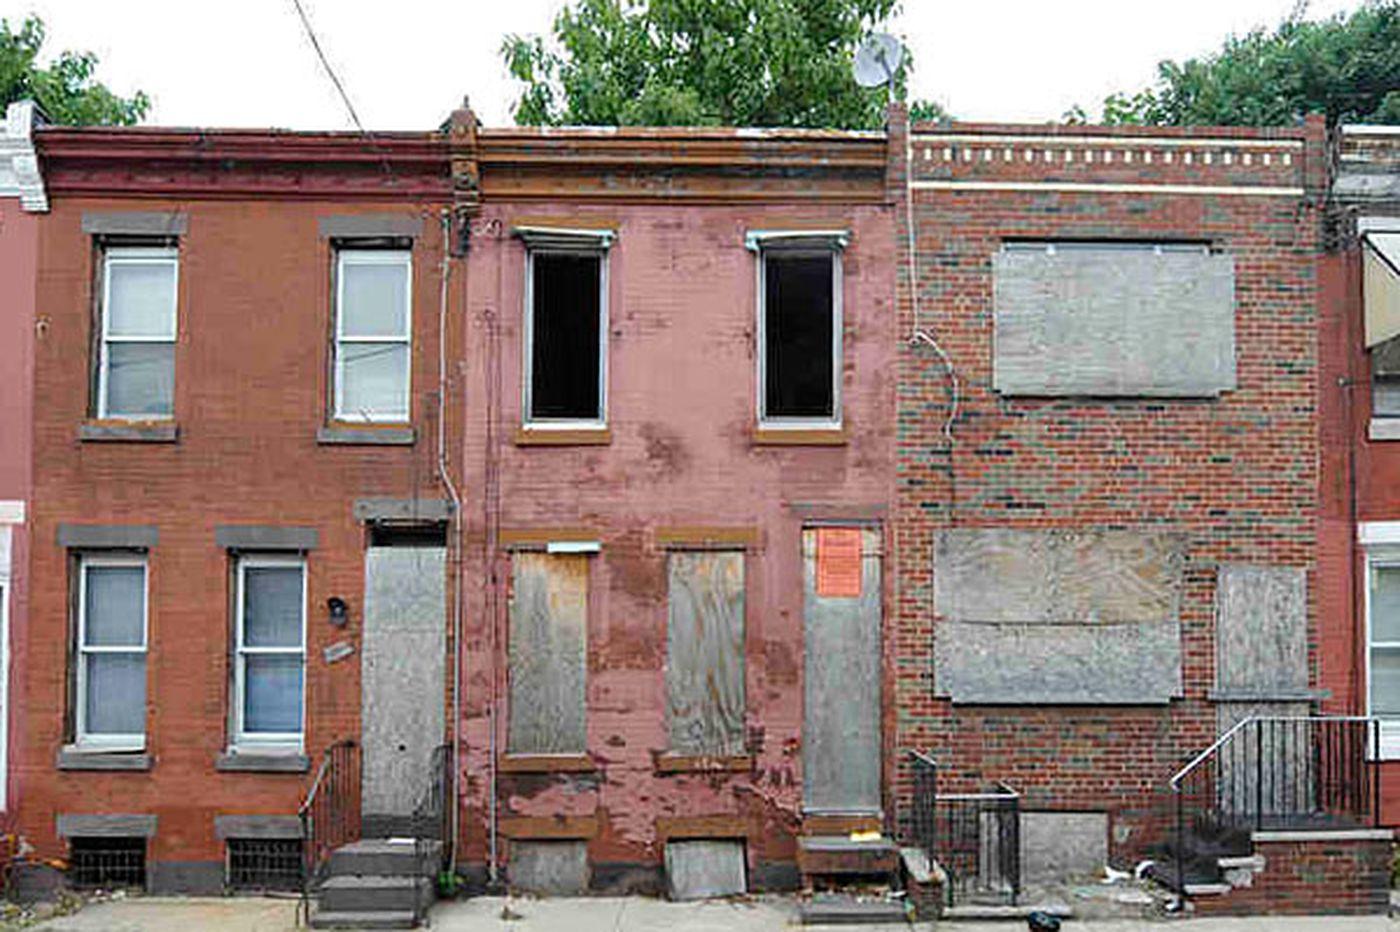 Plan for a Philadelphia city land bank is taking steps forward